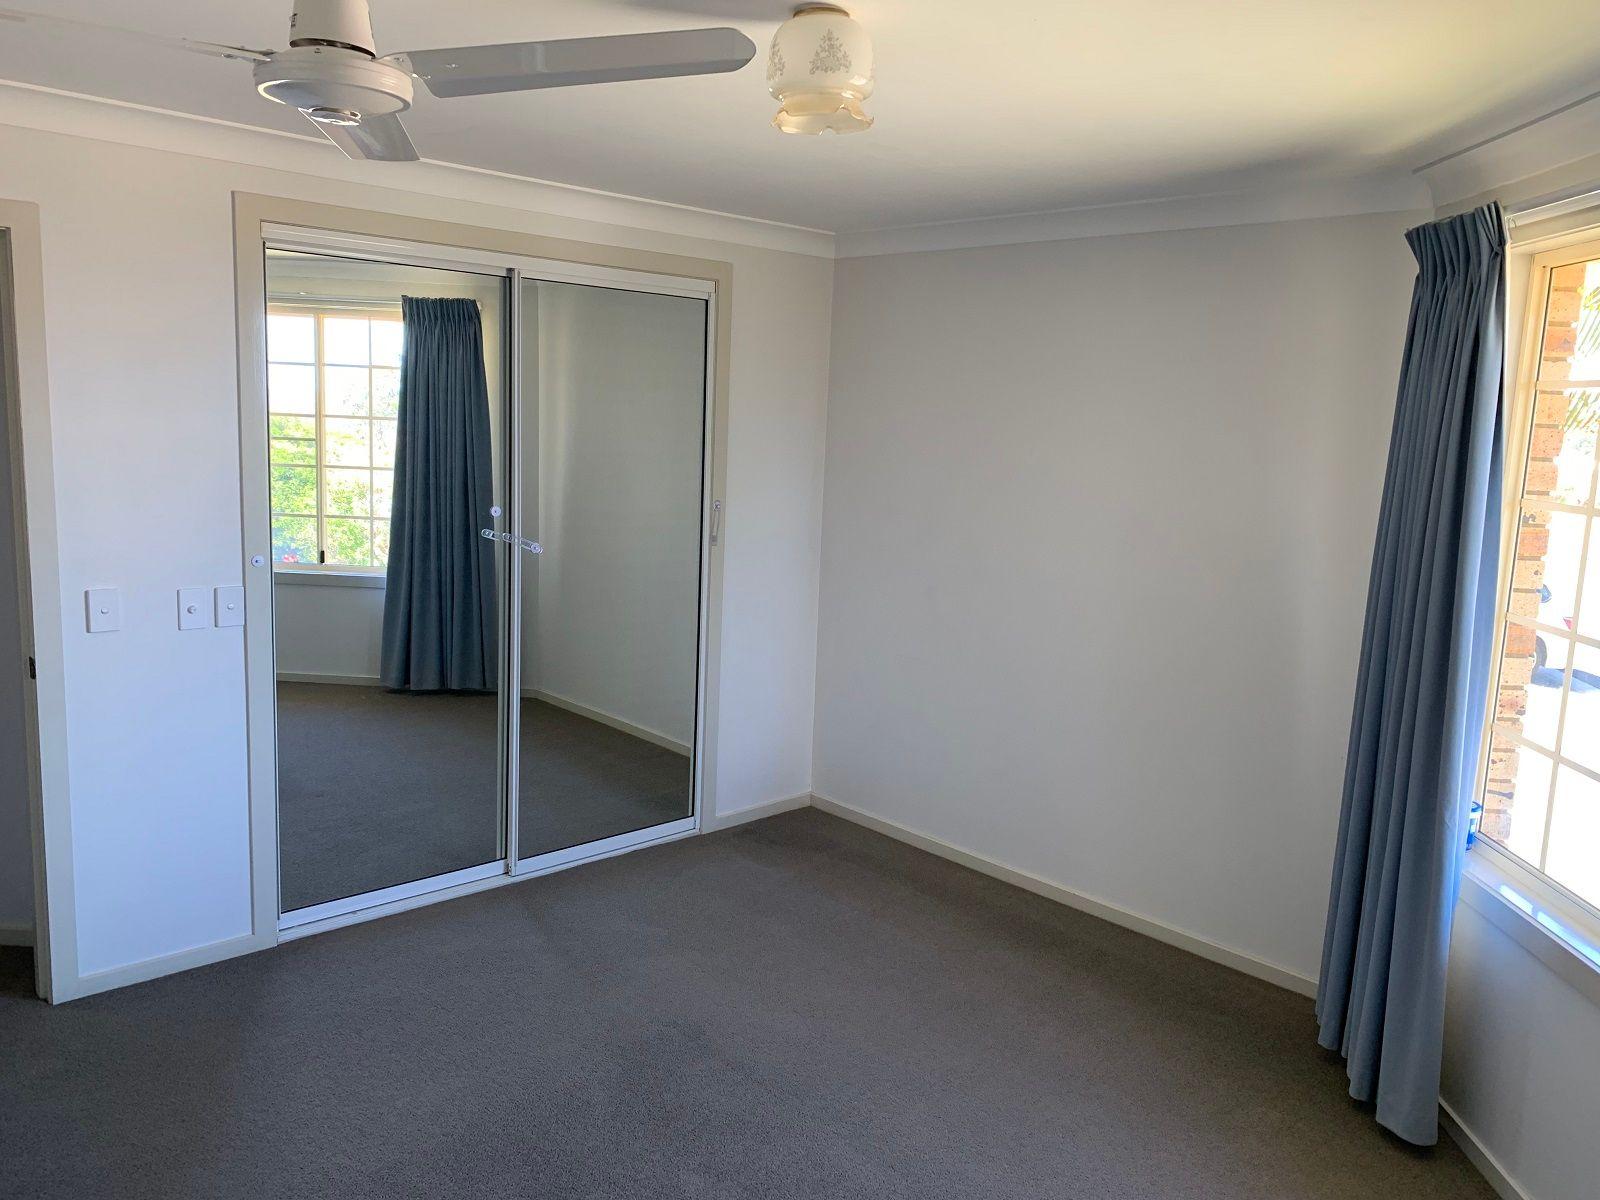 2/196 Invercauld Road, Goonellabah, NSW 2480